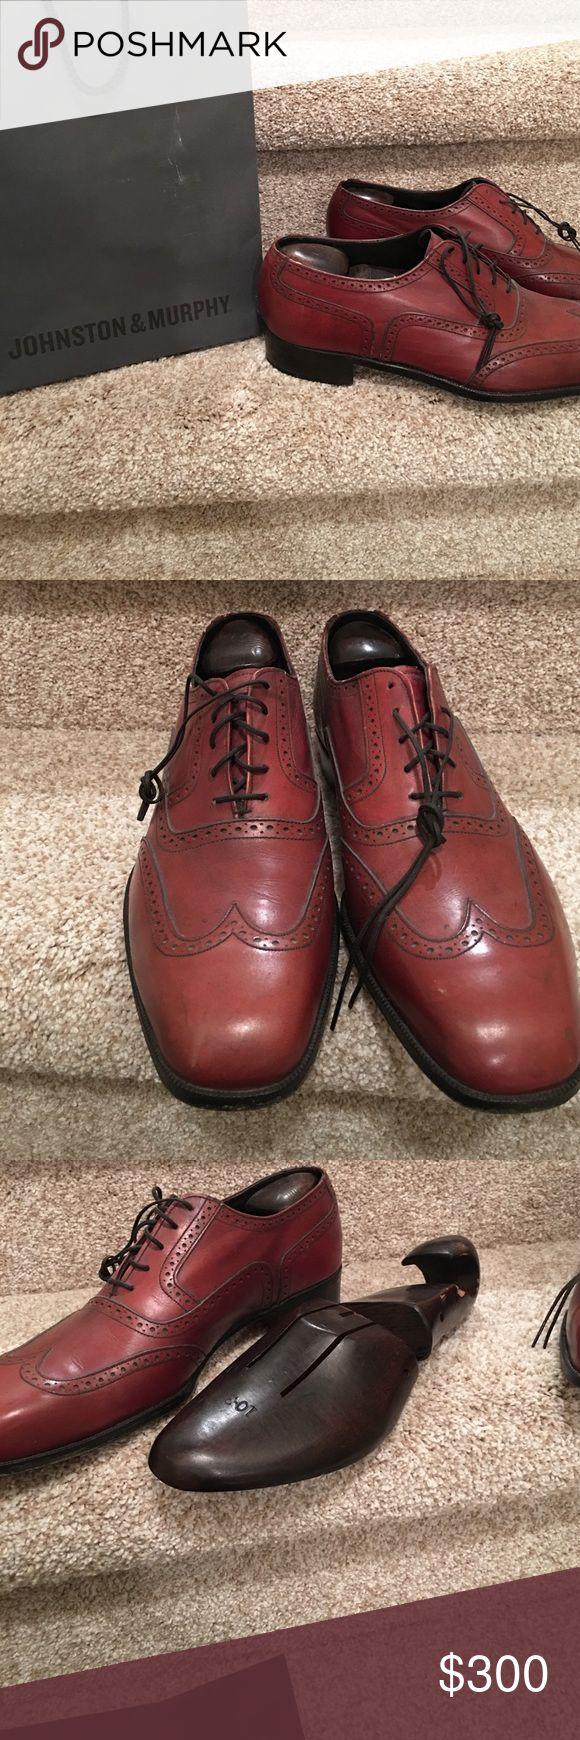 "Handmade Johnston & Murphy ""aristocraft"" *gems* Very quality vintage Johnston & Murphy ""aristocrat"" winged tips Johnston & Murphy Shoes Loafers & Slip-Ons"